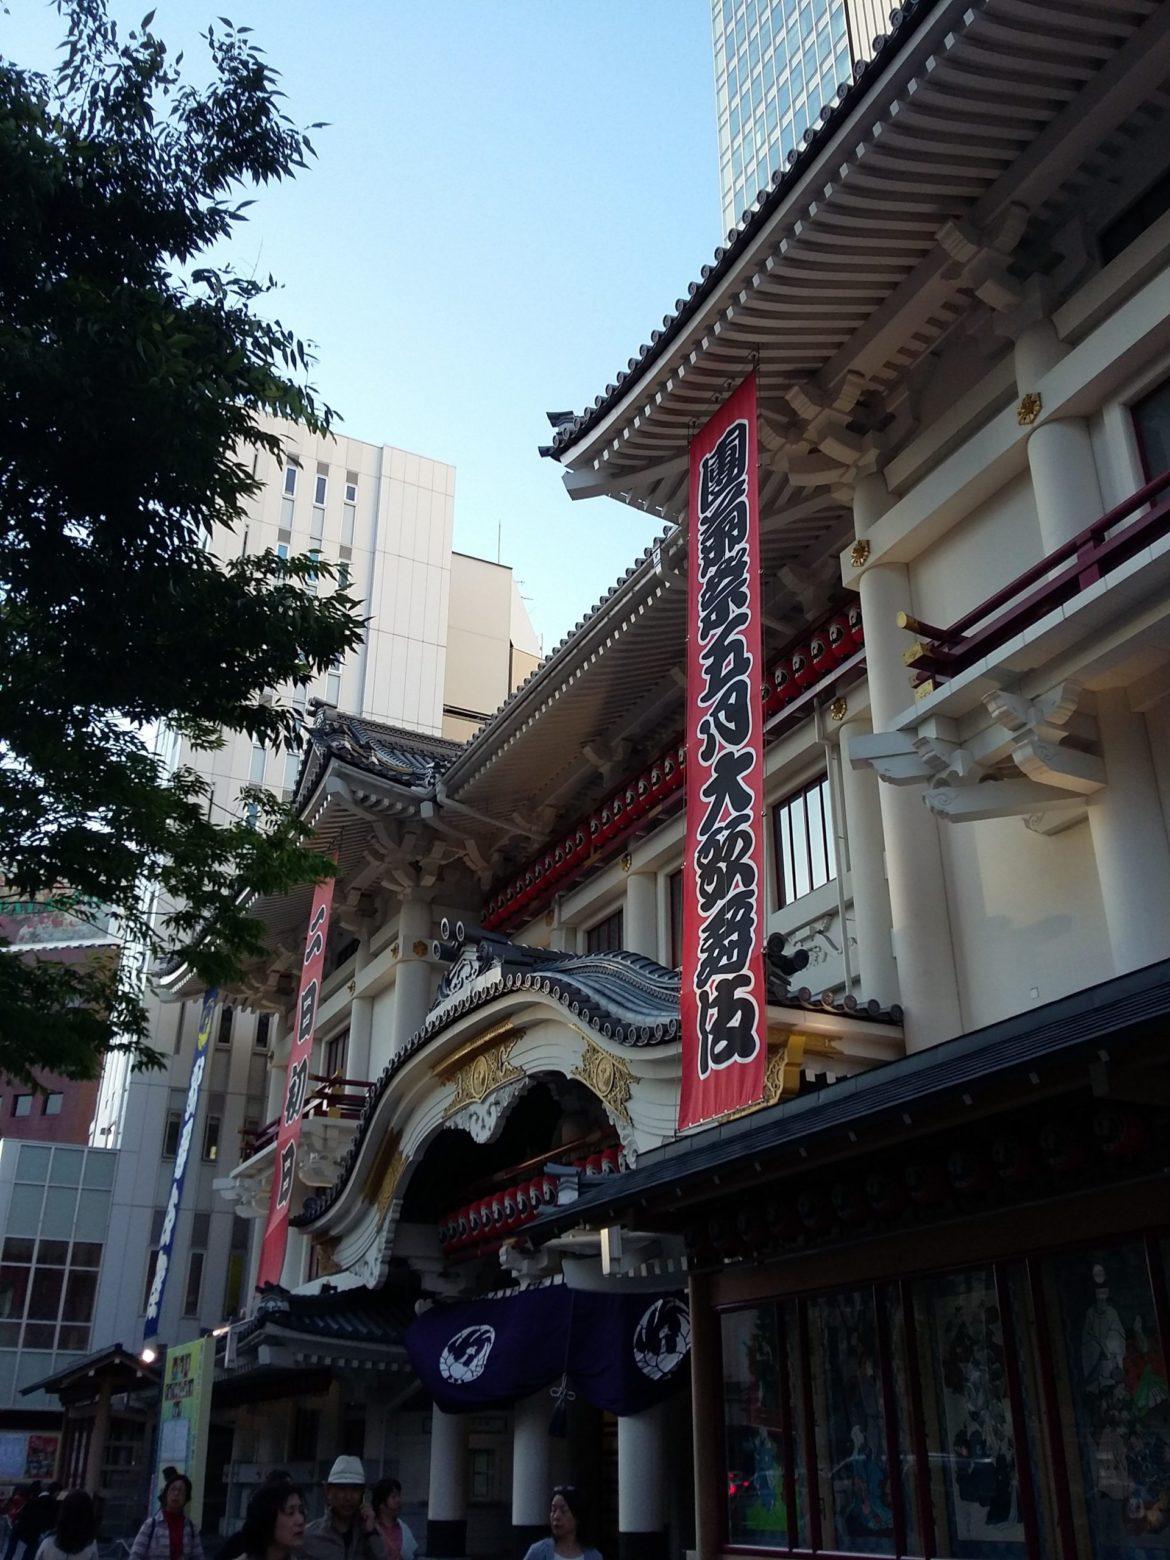 Tokyo_Ginza_Kabukiza_TeaVoyages.com